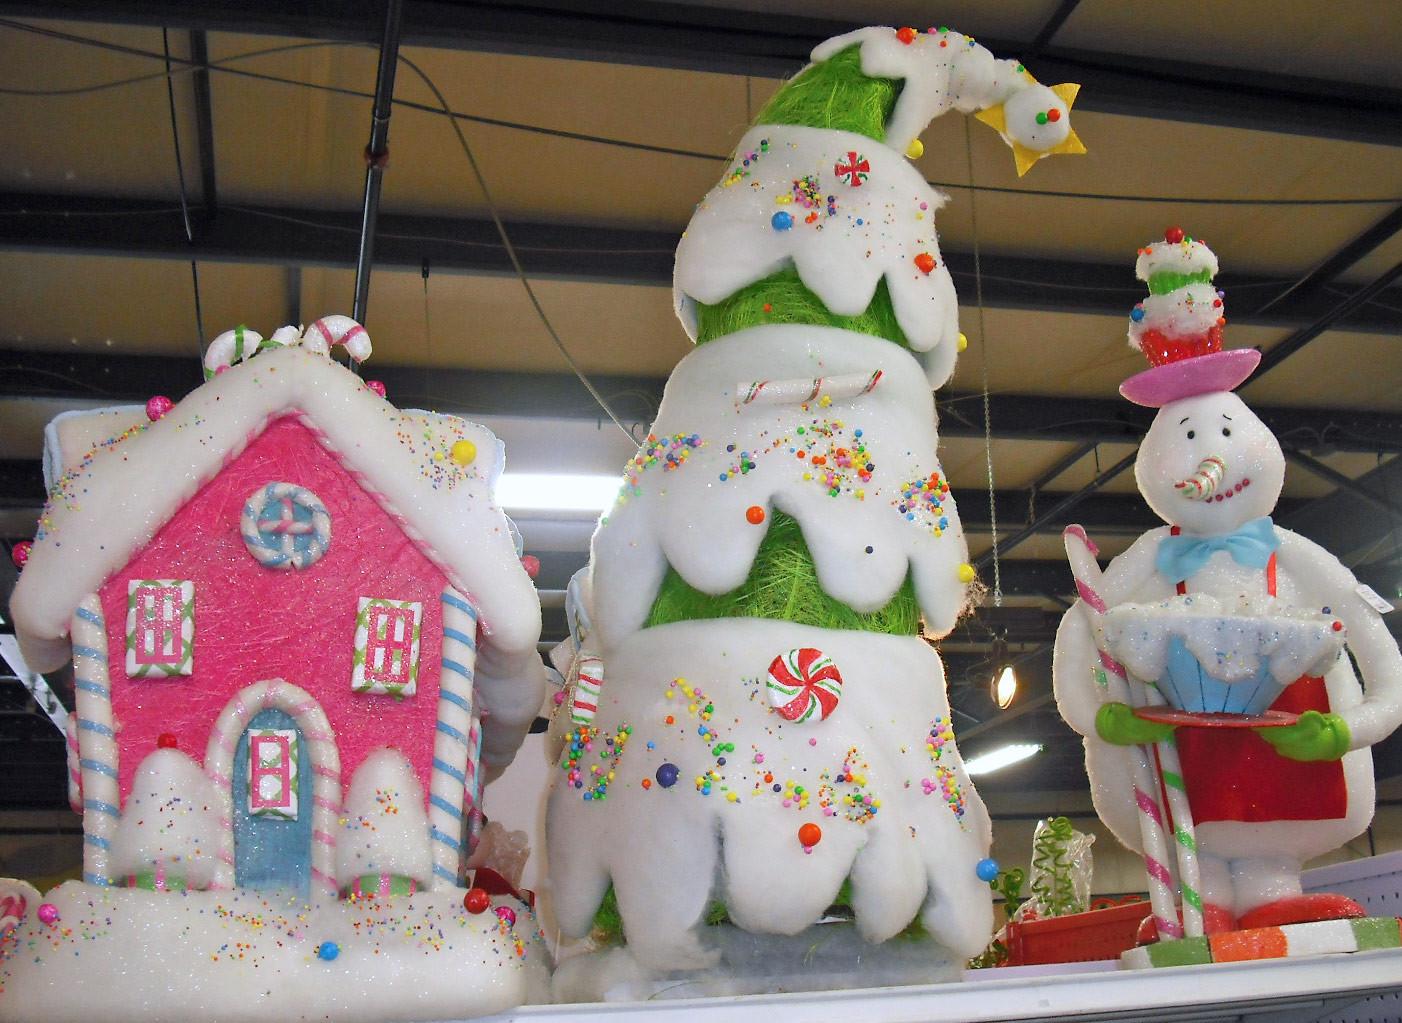 Candy Themed Christmas Ornaments  Studio B UberArt Twelve Days of Christmas Trees Day 10